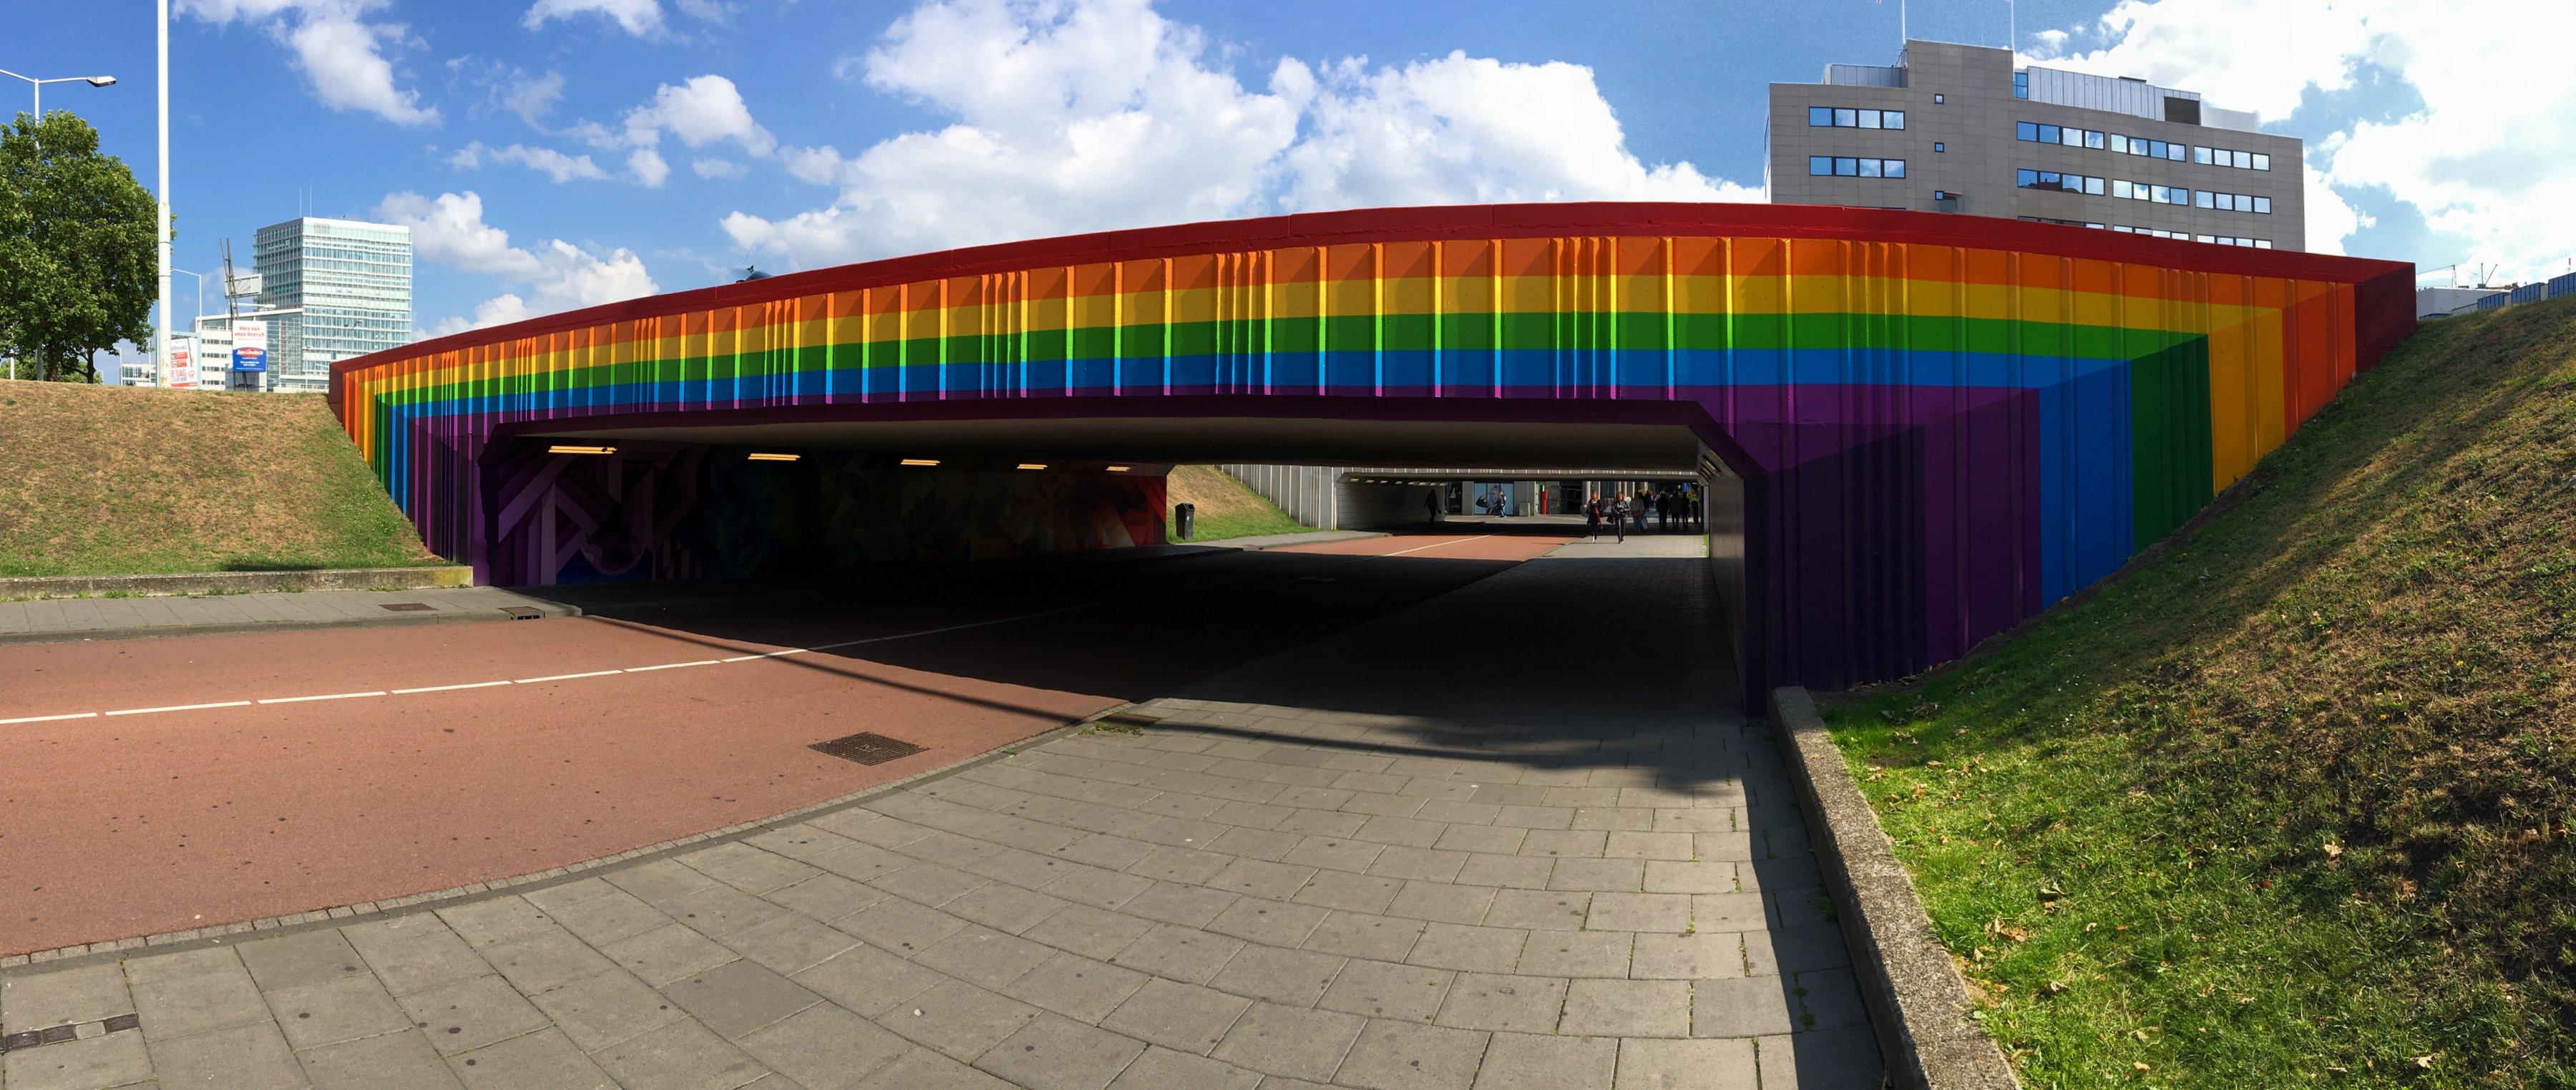 Regenboogtunnel Fellenoord Eindhoven